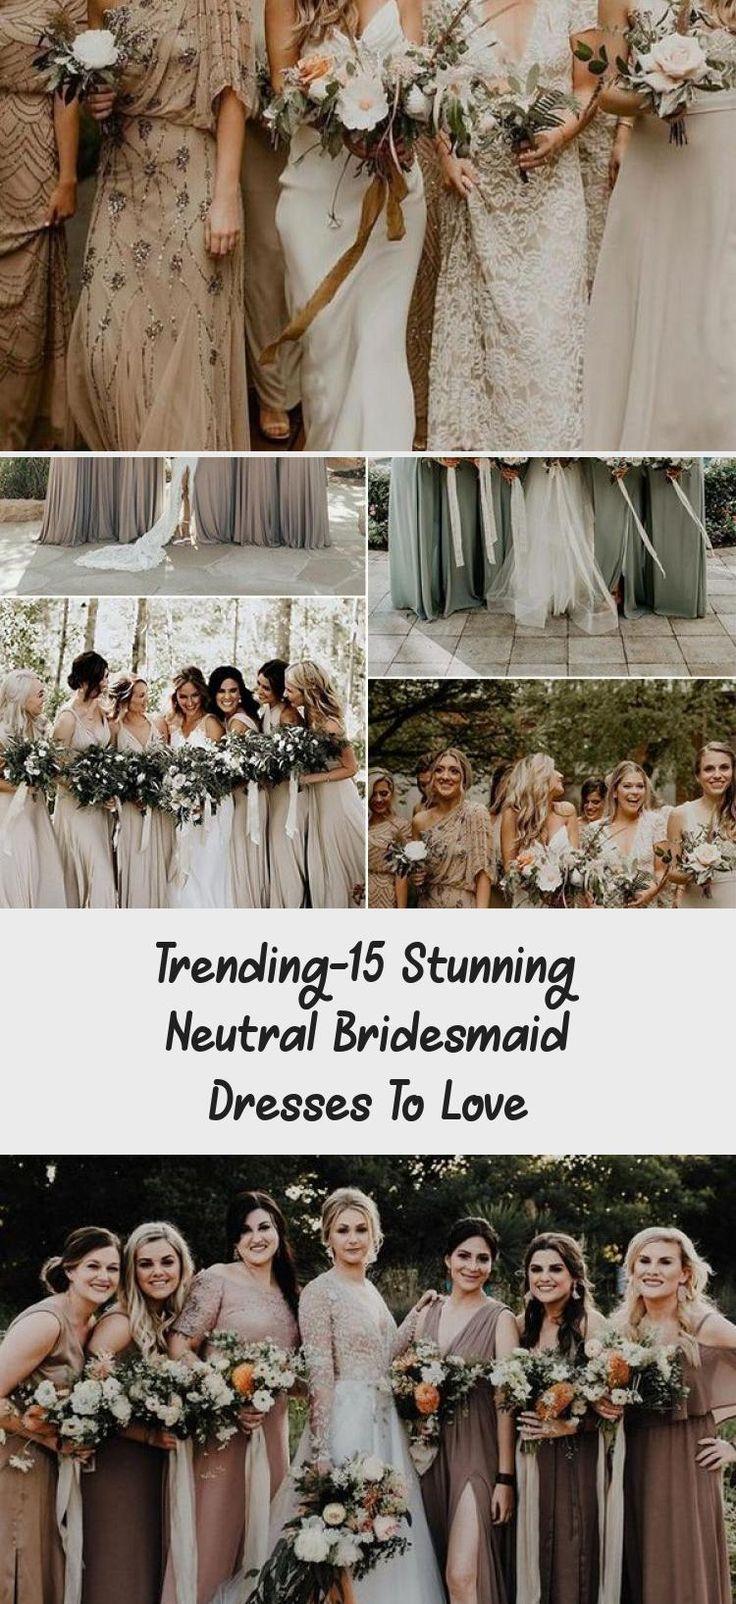 neutral champagne bridesmaid dresses #obde #weddingideas2019 #AfricanBridesmaidDresses #BridesmaidDressesNavy #RedBridesmaidDresses #BridesmaidDressesCountry #BridesmaidDressesMint